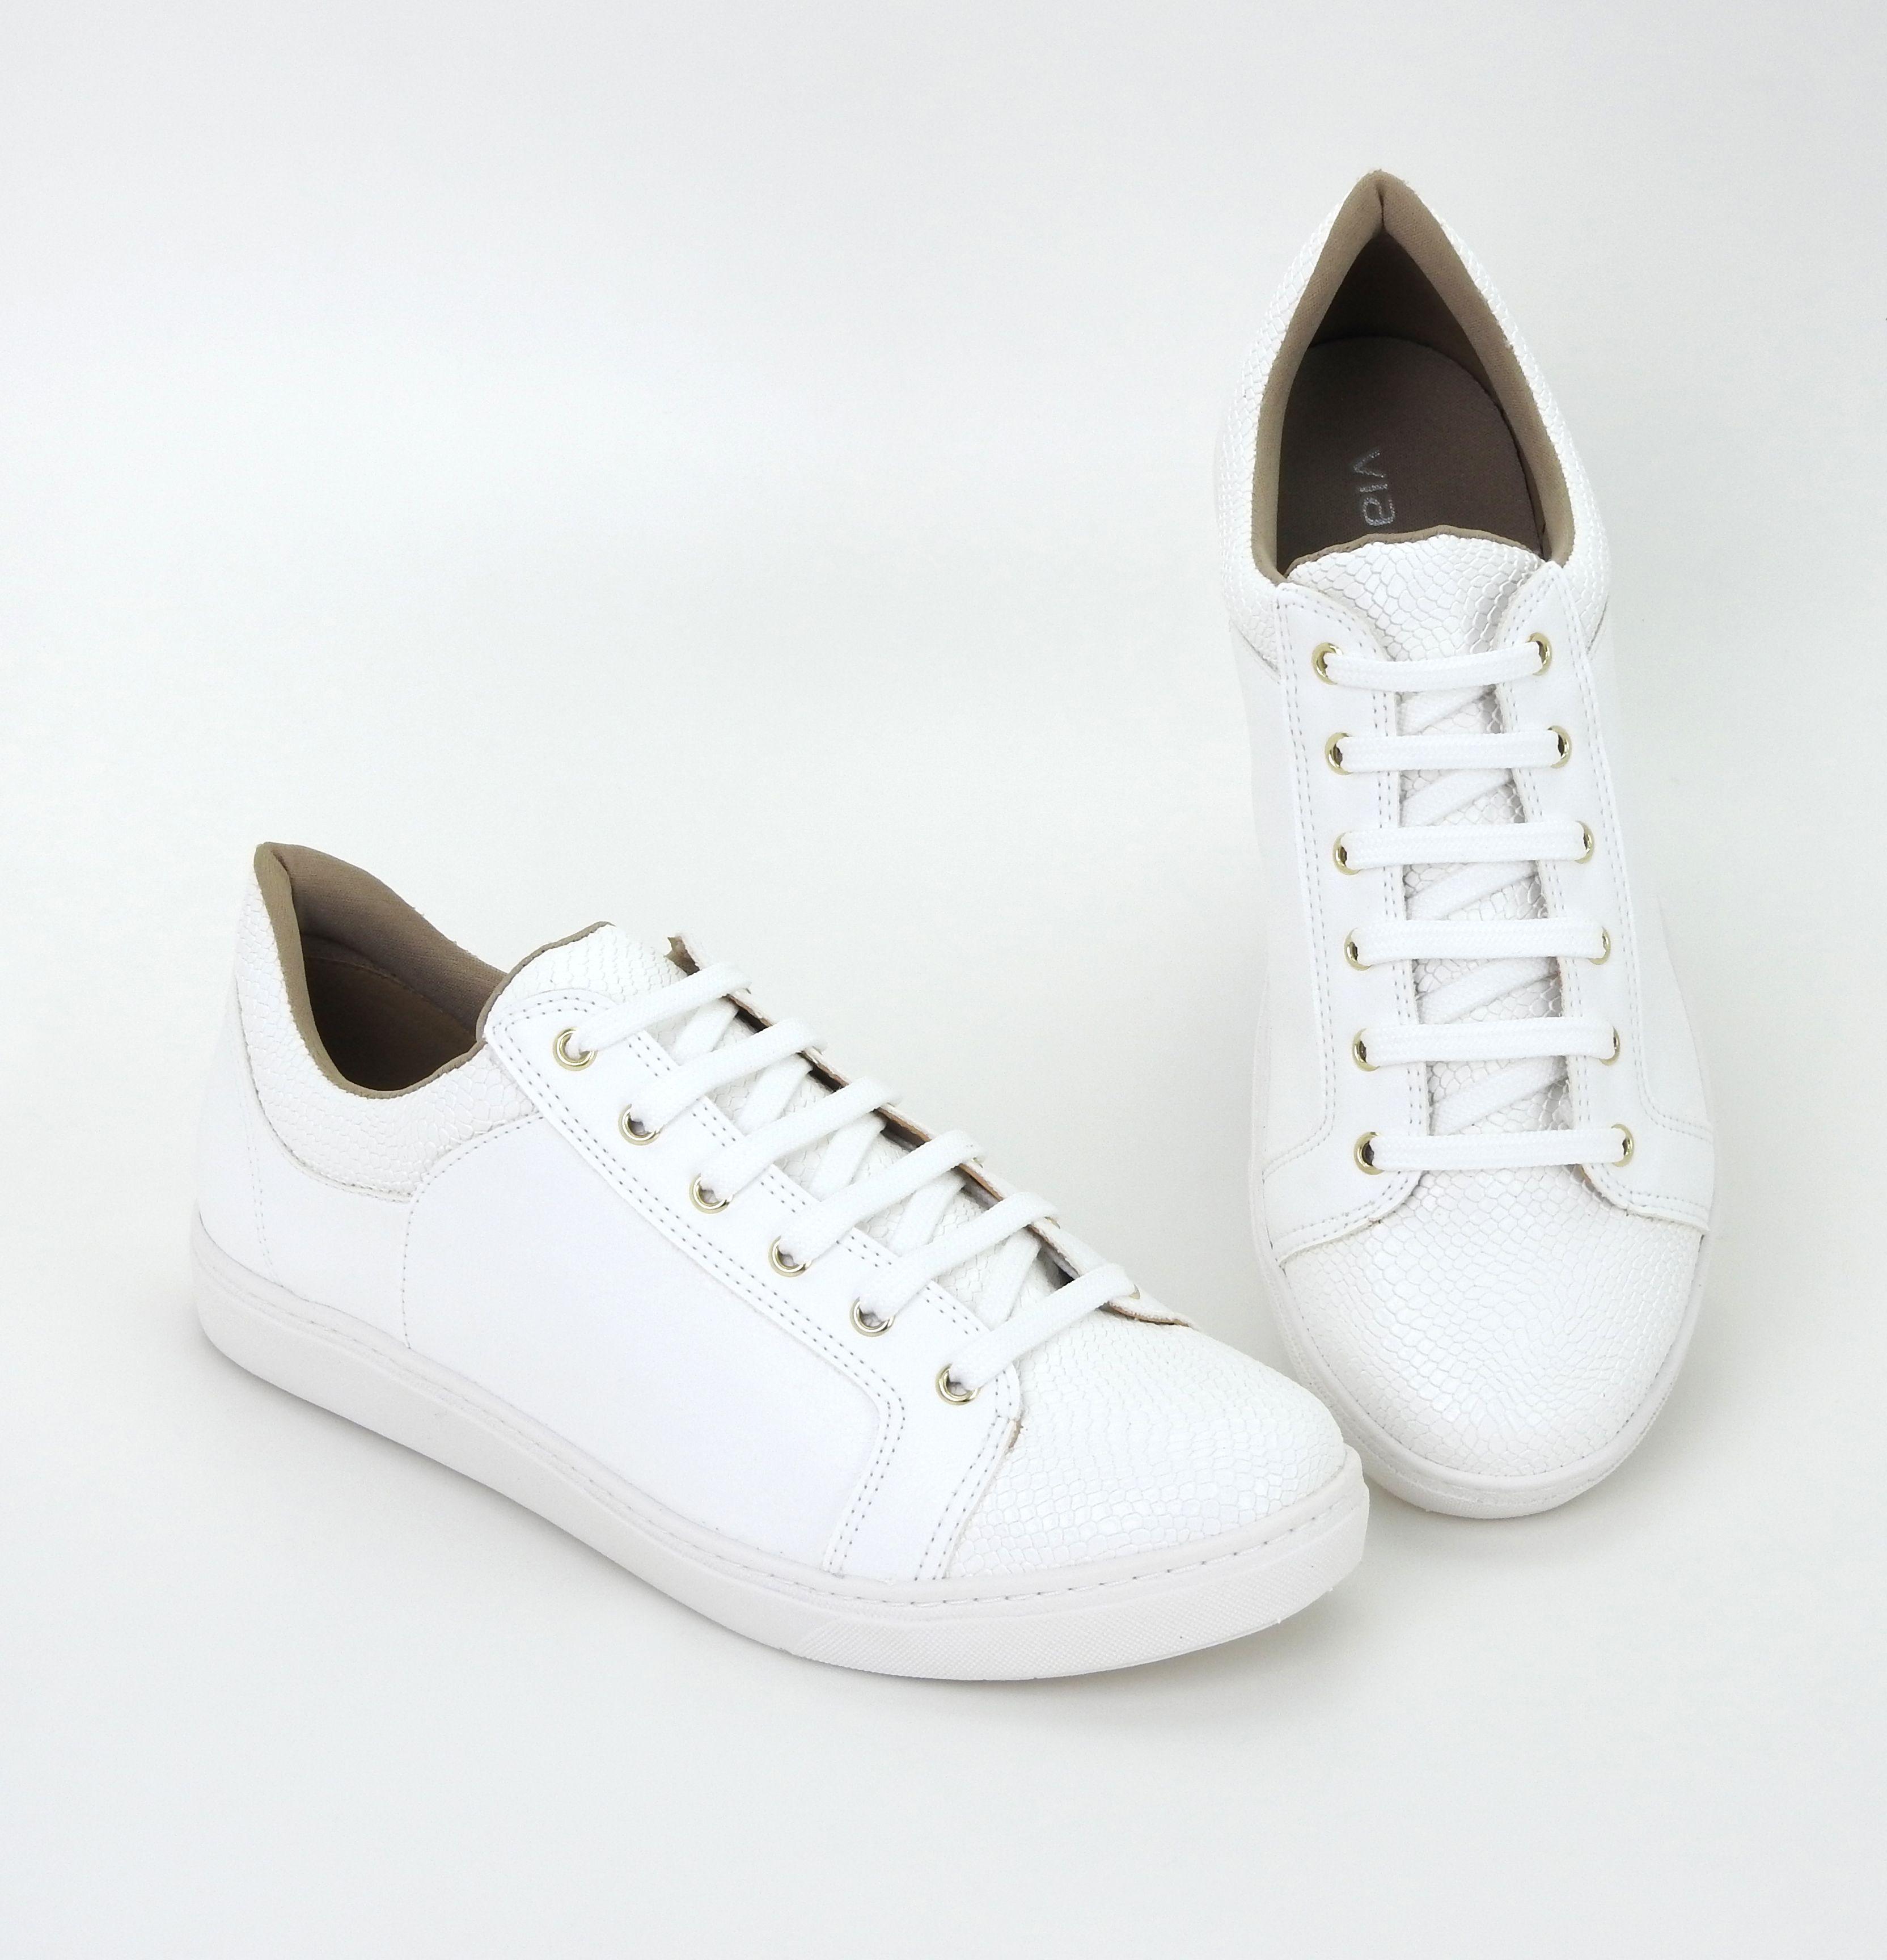 42bbcfce2dc tênis - tendência - trend - sneaker - new in Ref. 16-12406